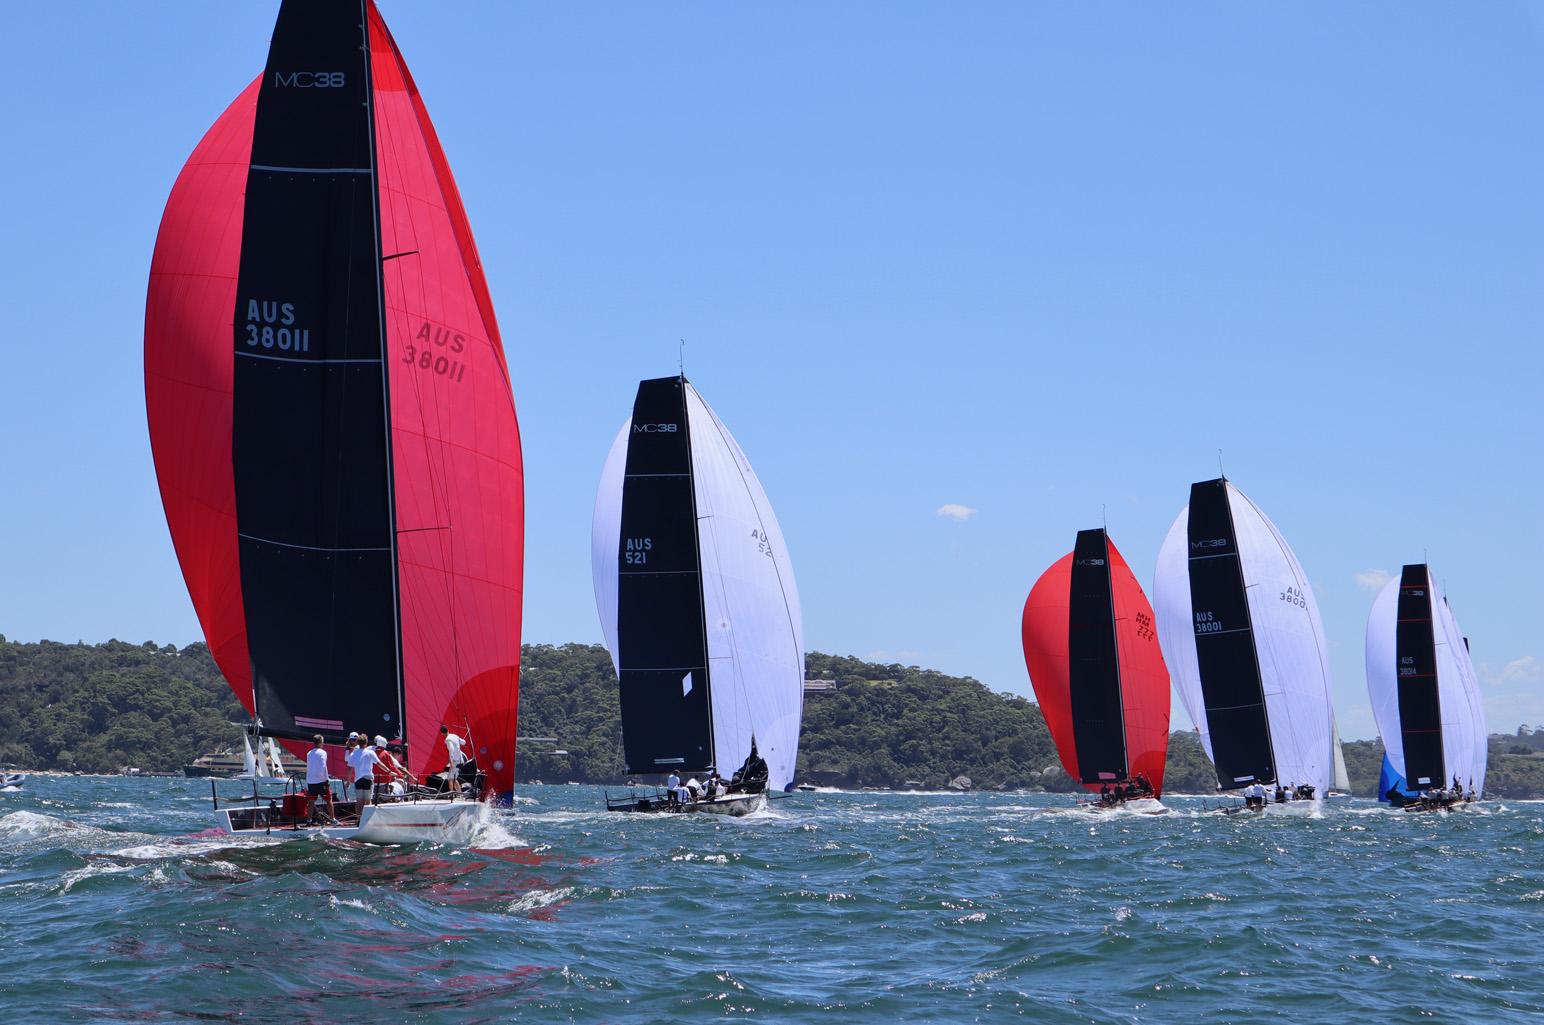 MC38 Act 1 fleet downwind day 2. Photo credit Lisa Ratcliff-OCC.